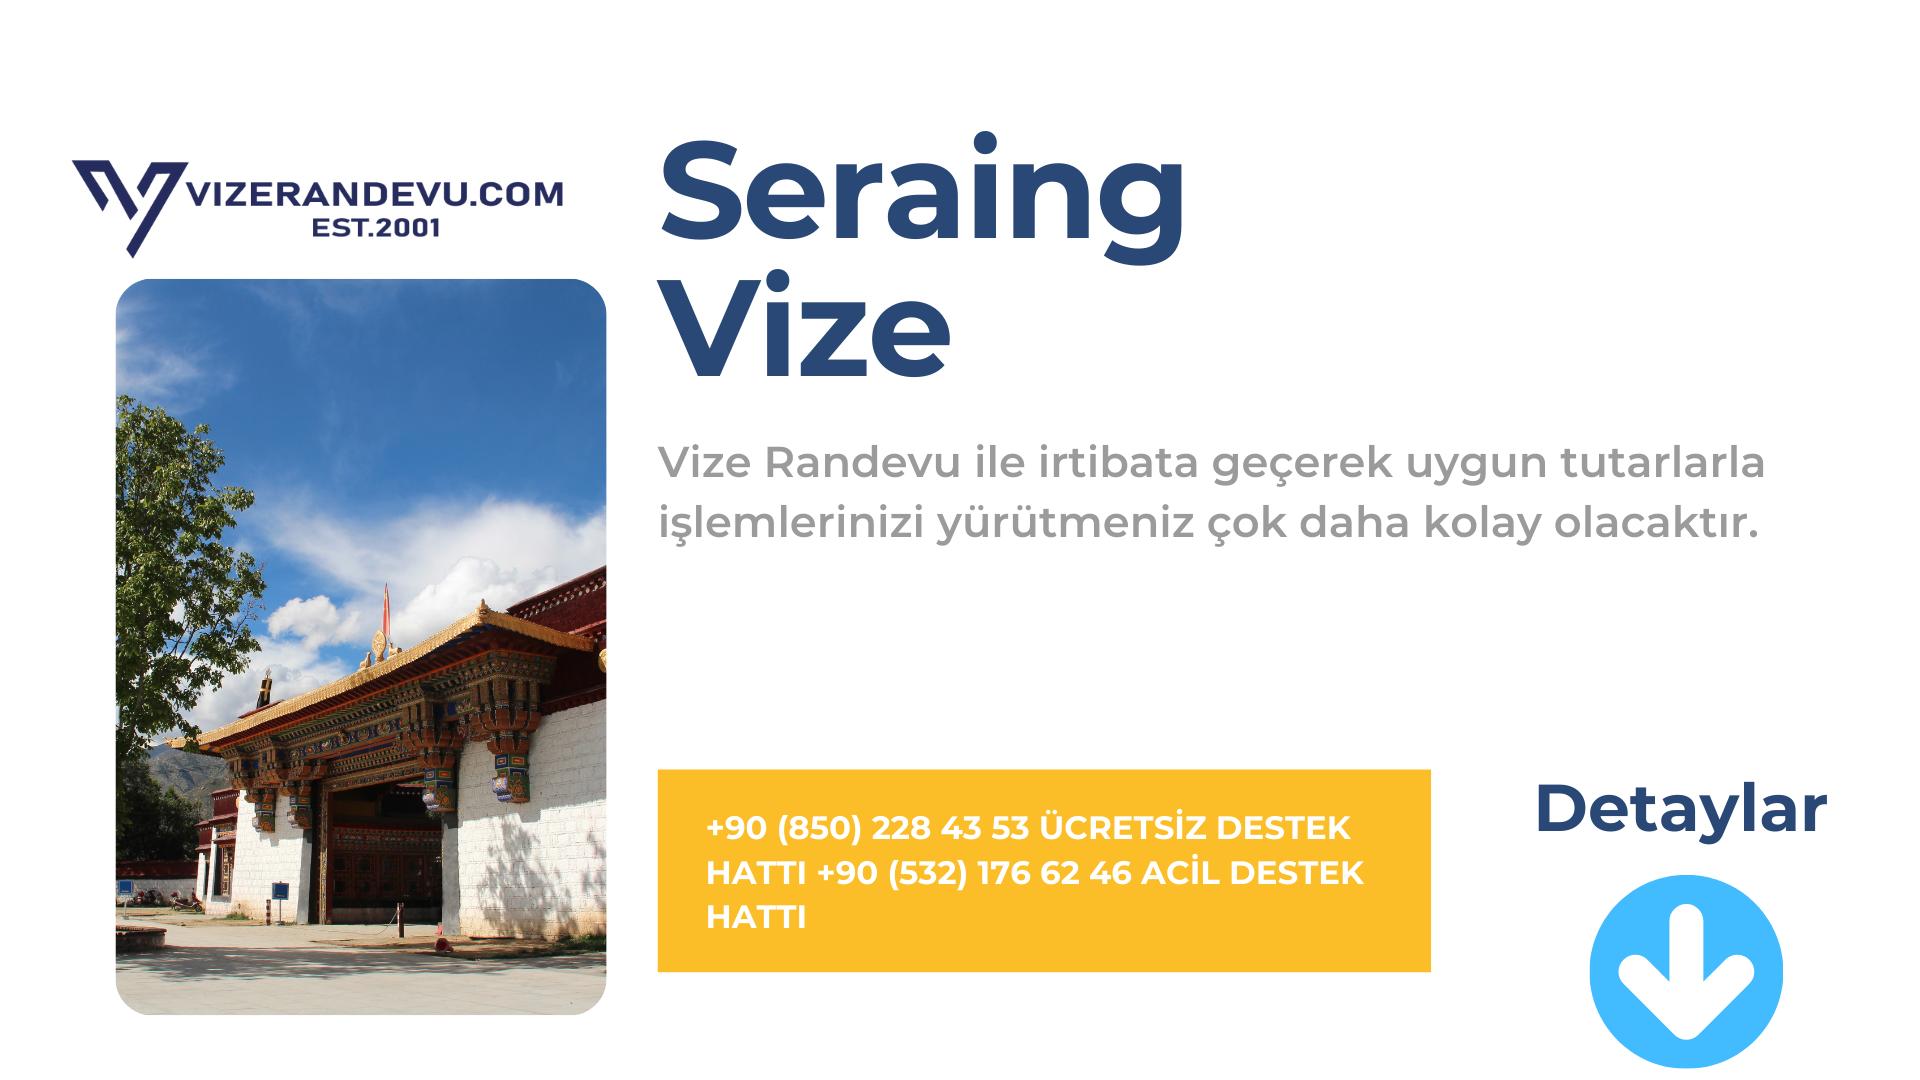 Seraing Vize